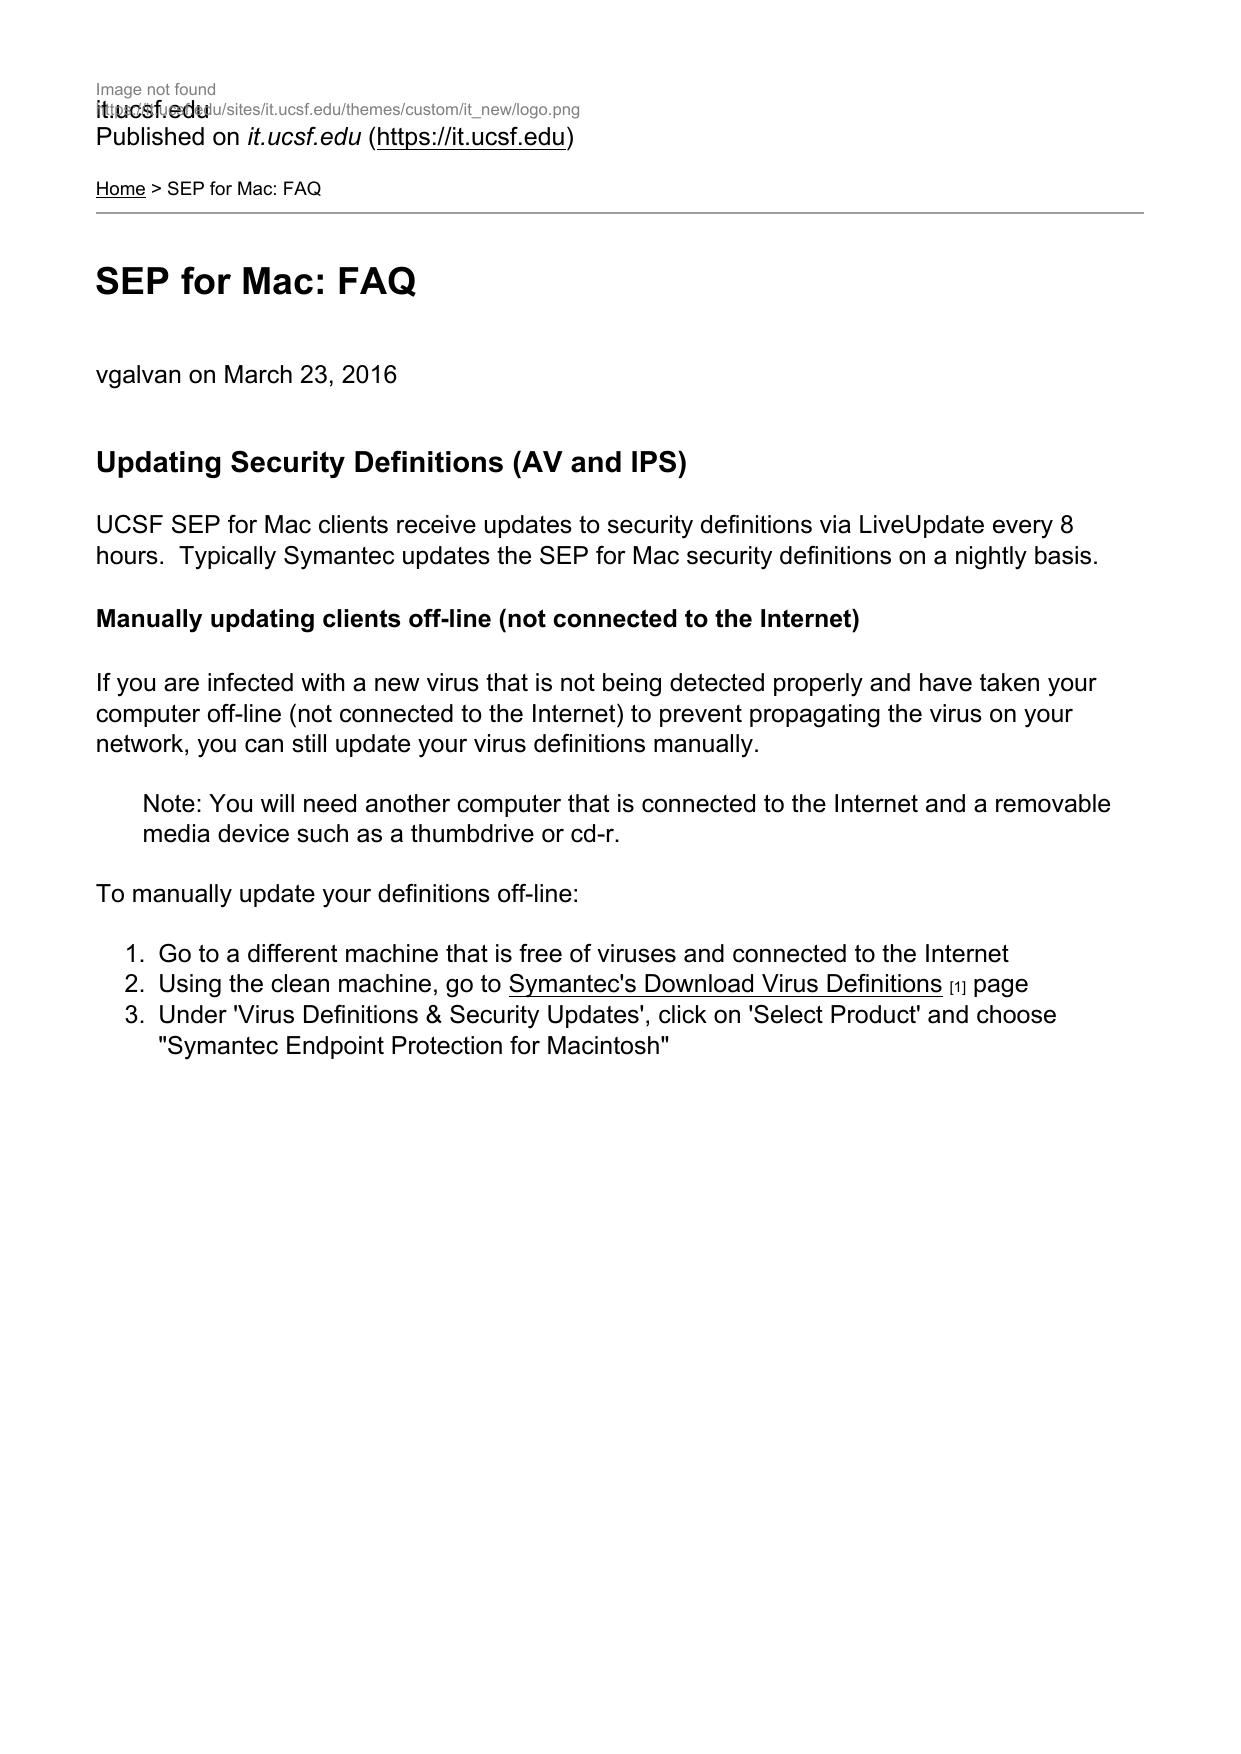 SEP for Mac: FAQ - UCSF IT Service Desk   manualzz com